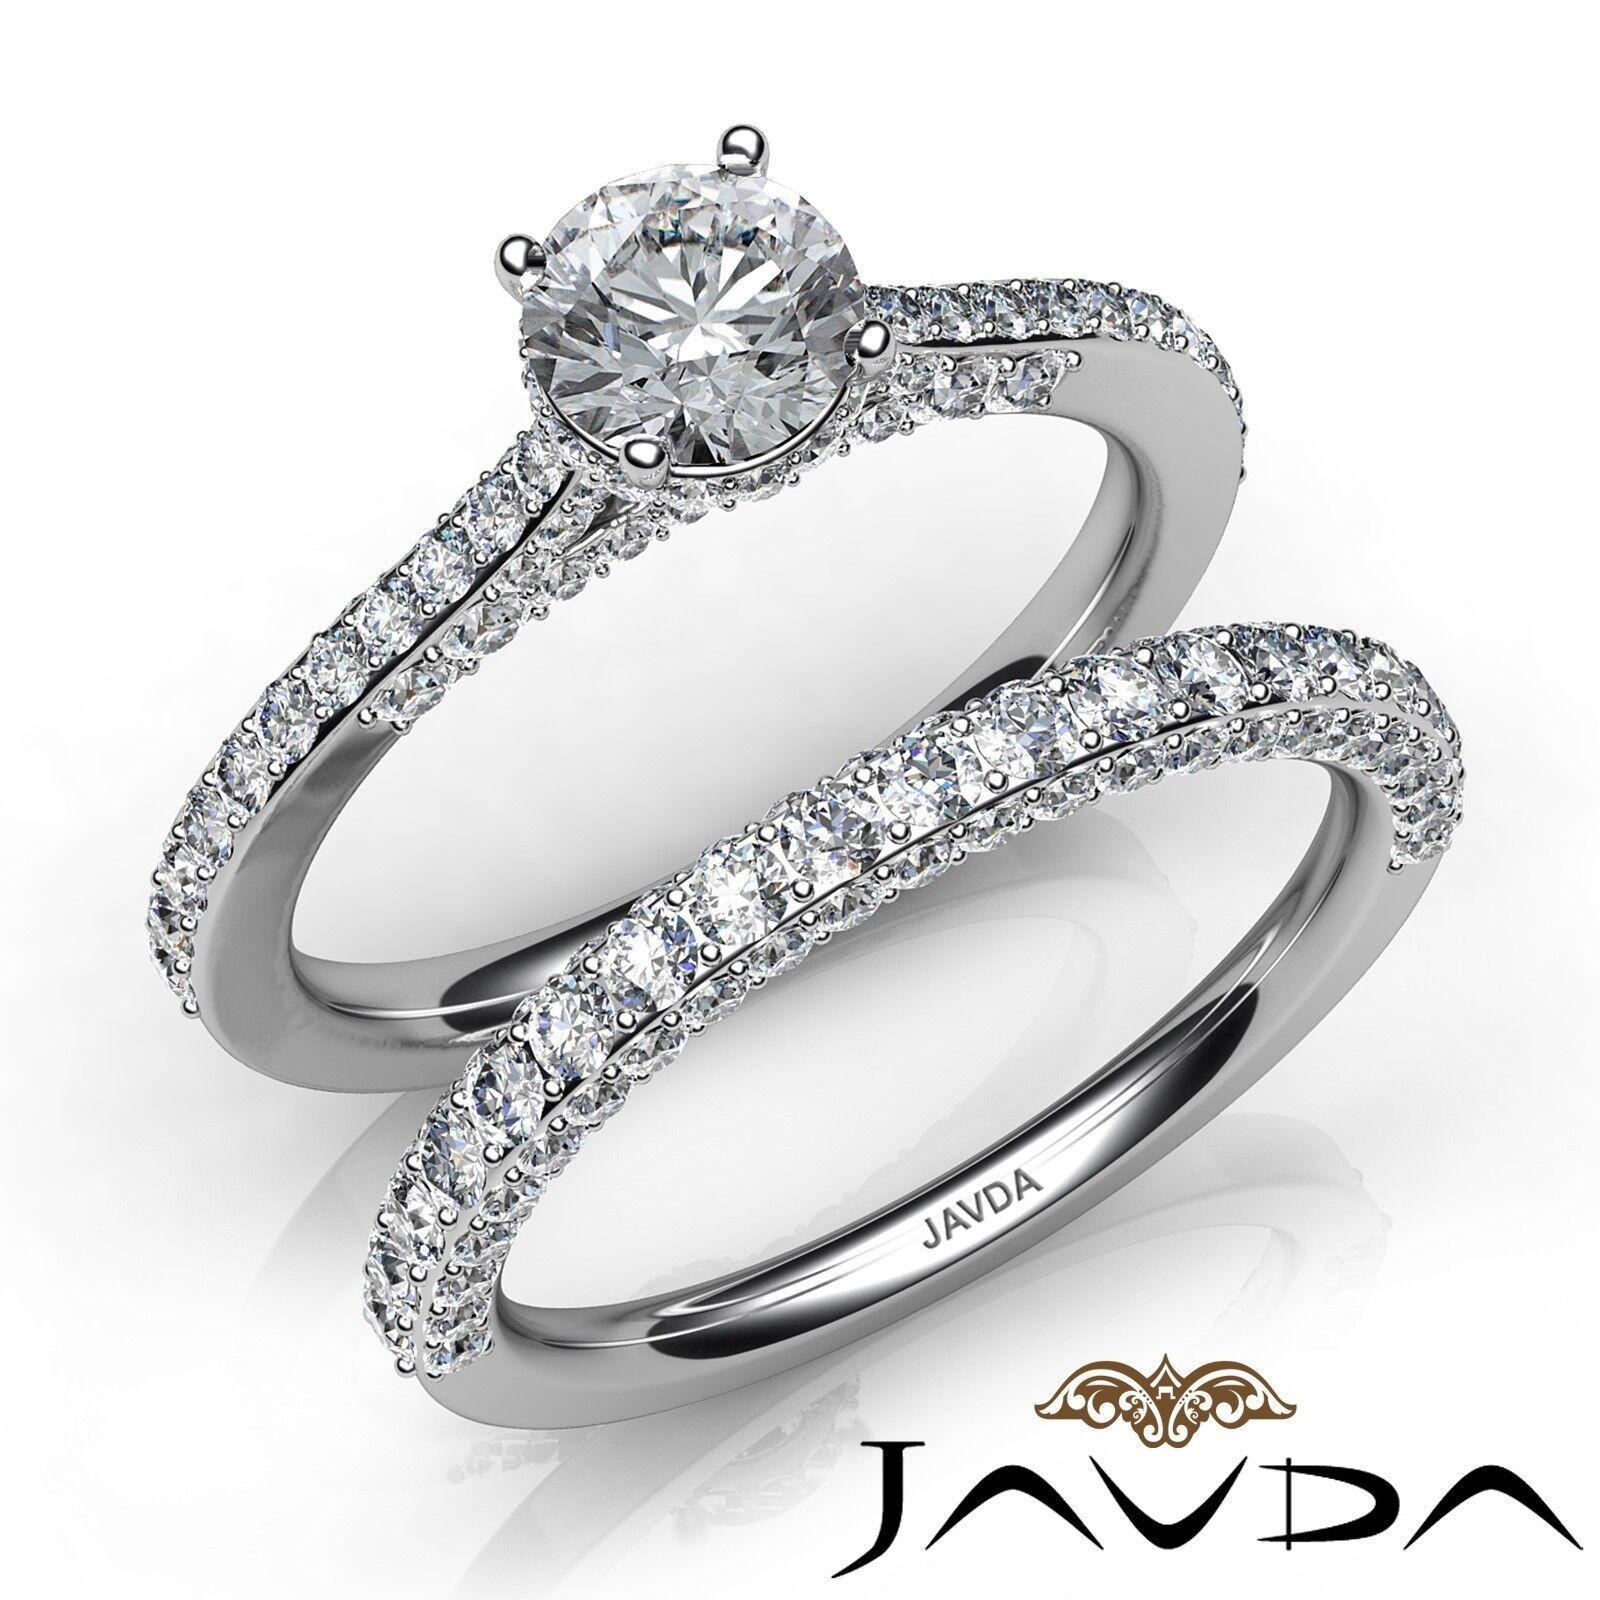 2.25ct Circa Halo Bridal Set Round Diamond Engagement Ring GIA G-VVS1 White Gold